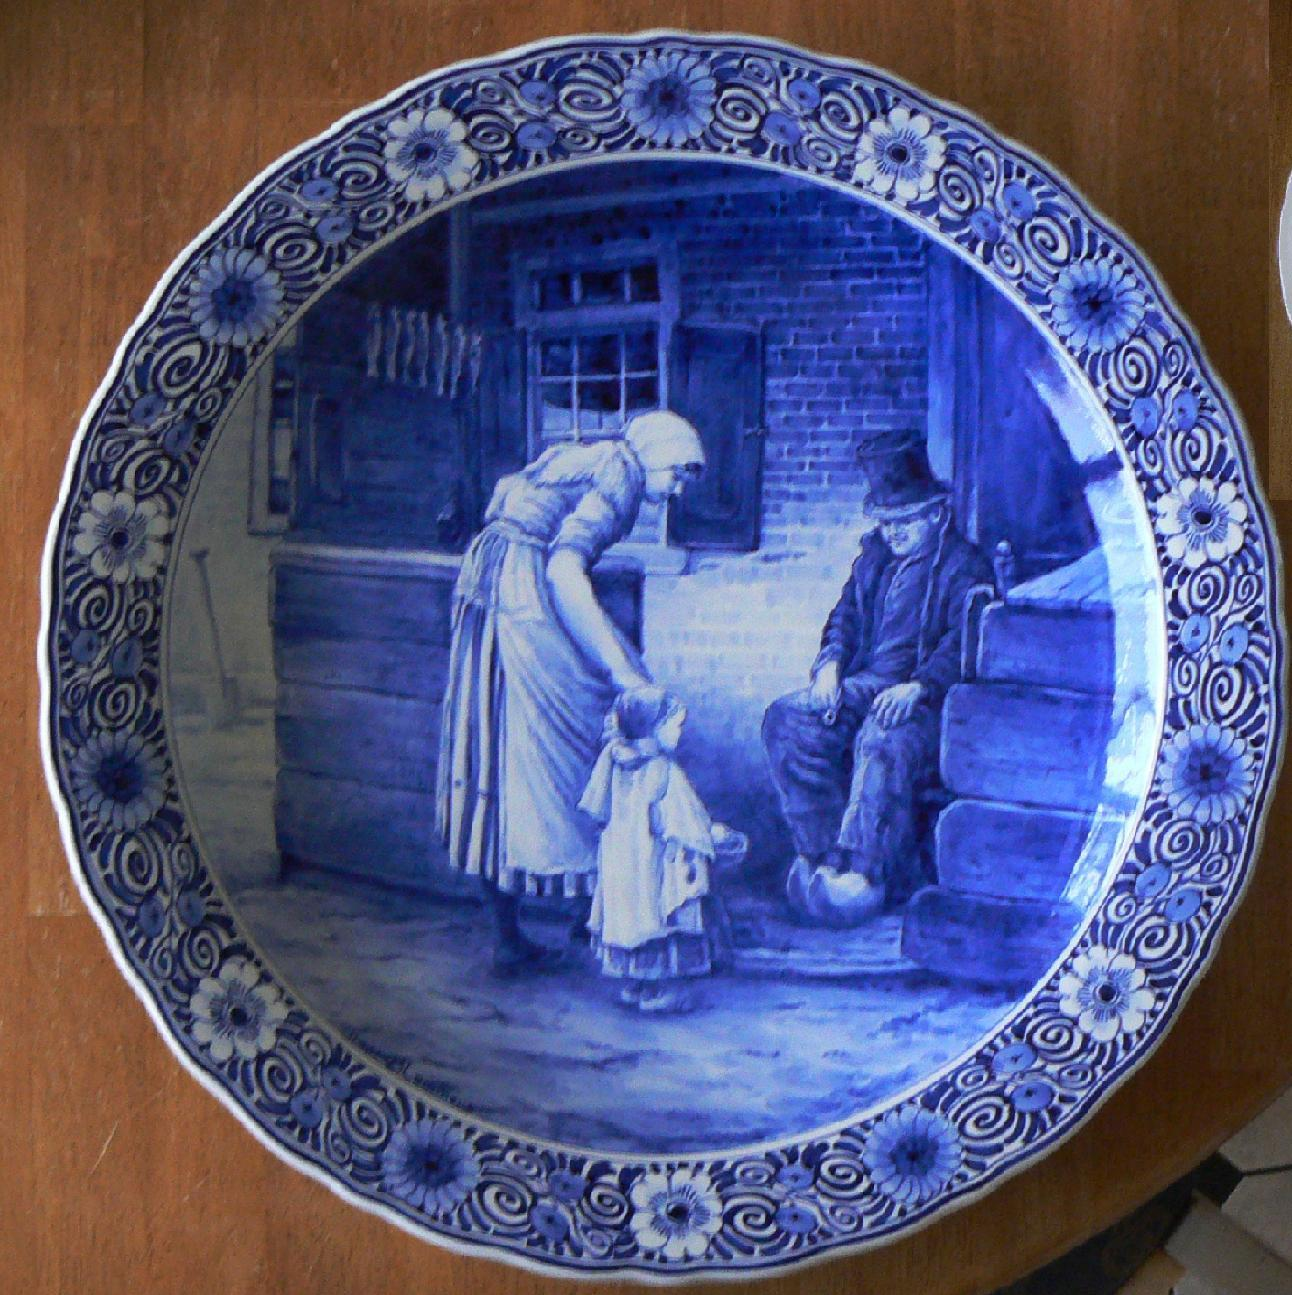 Blauwe Keuken Delft : Delfts Blauwe Keuken : Delfts blauwe behang huisjes (3)